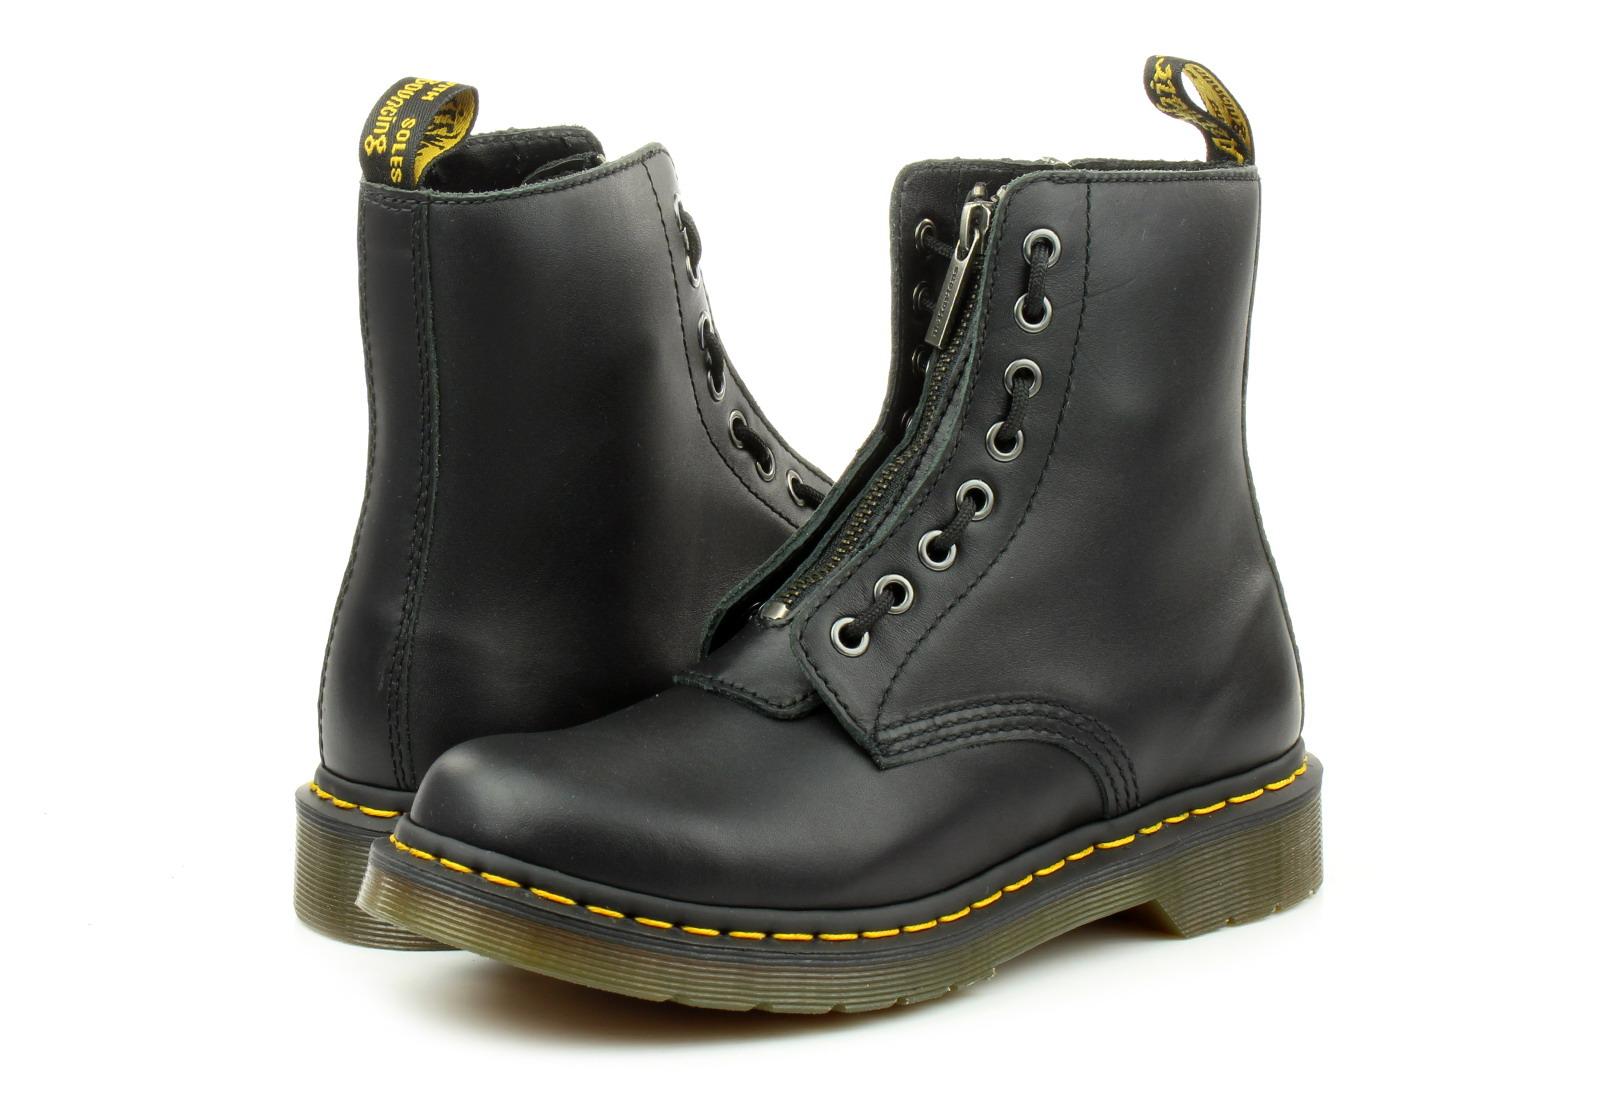 Dr Martens Boty - 1460 Pascal Frnt Zip - 8 Eye Zip Boot ... 102d2307ad